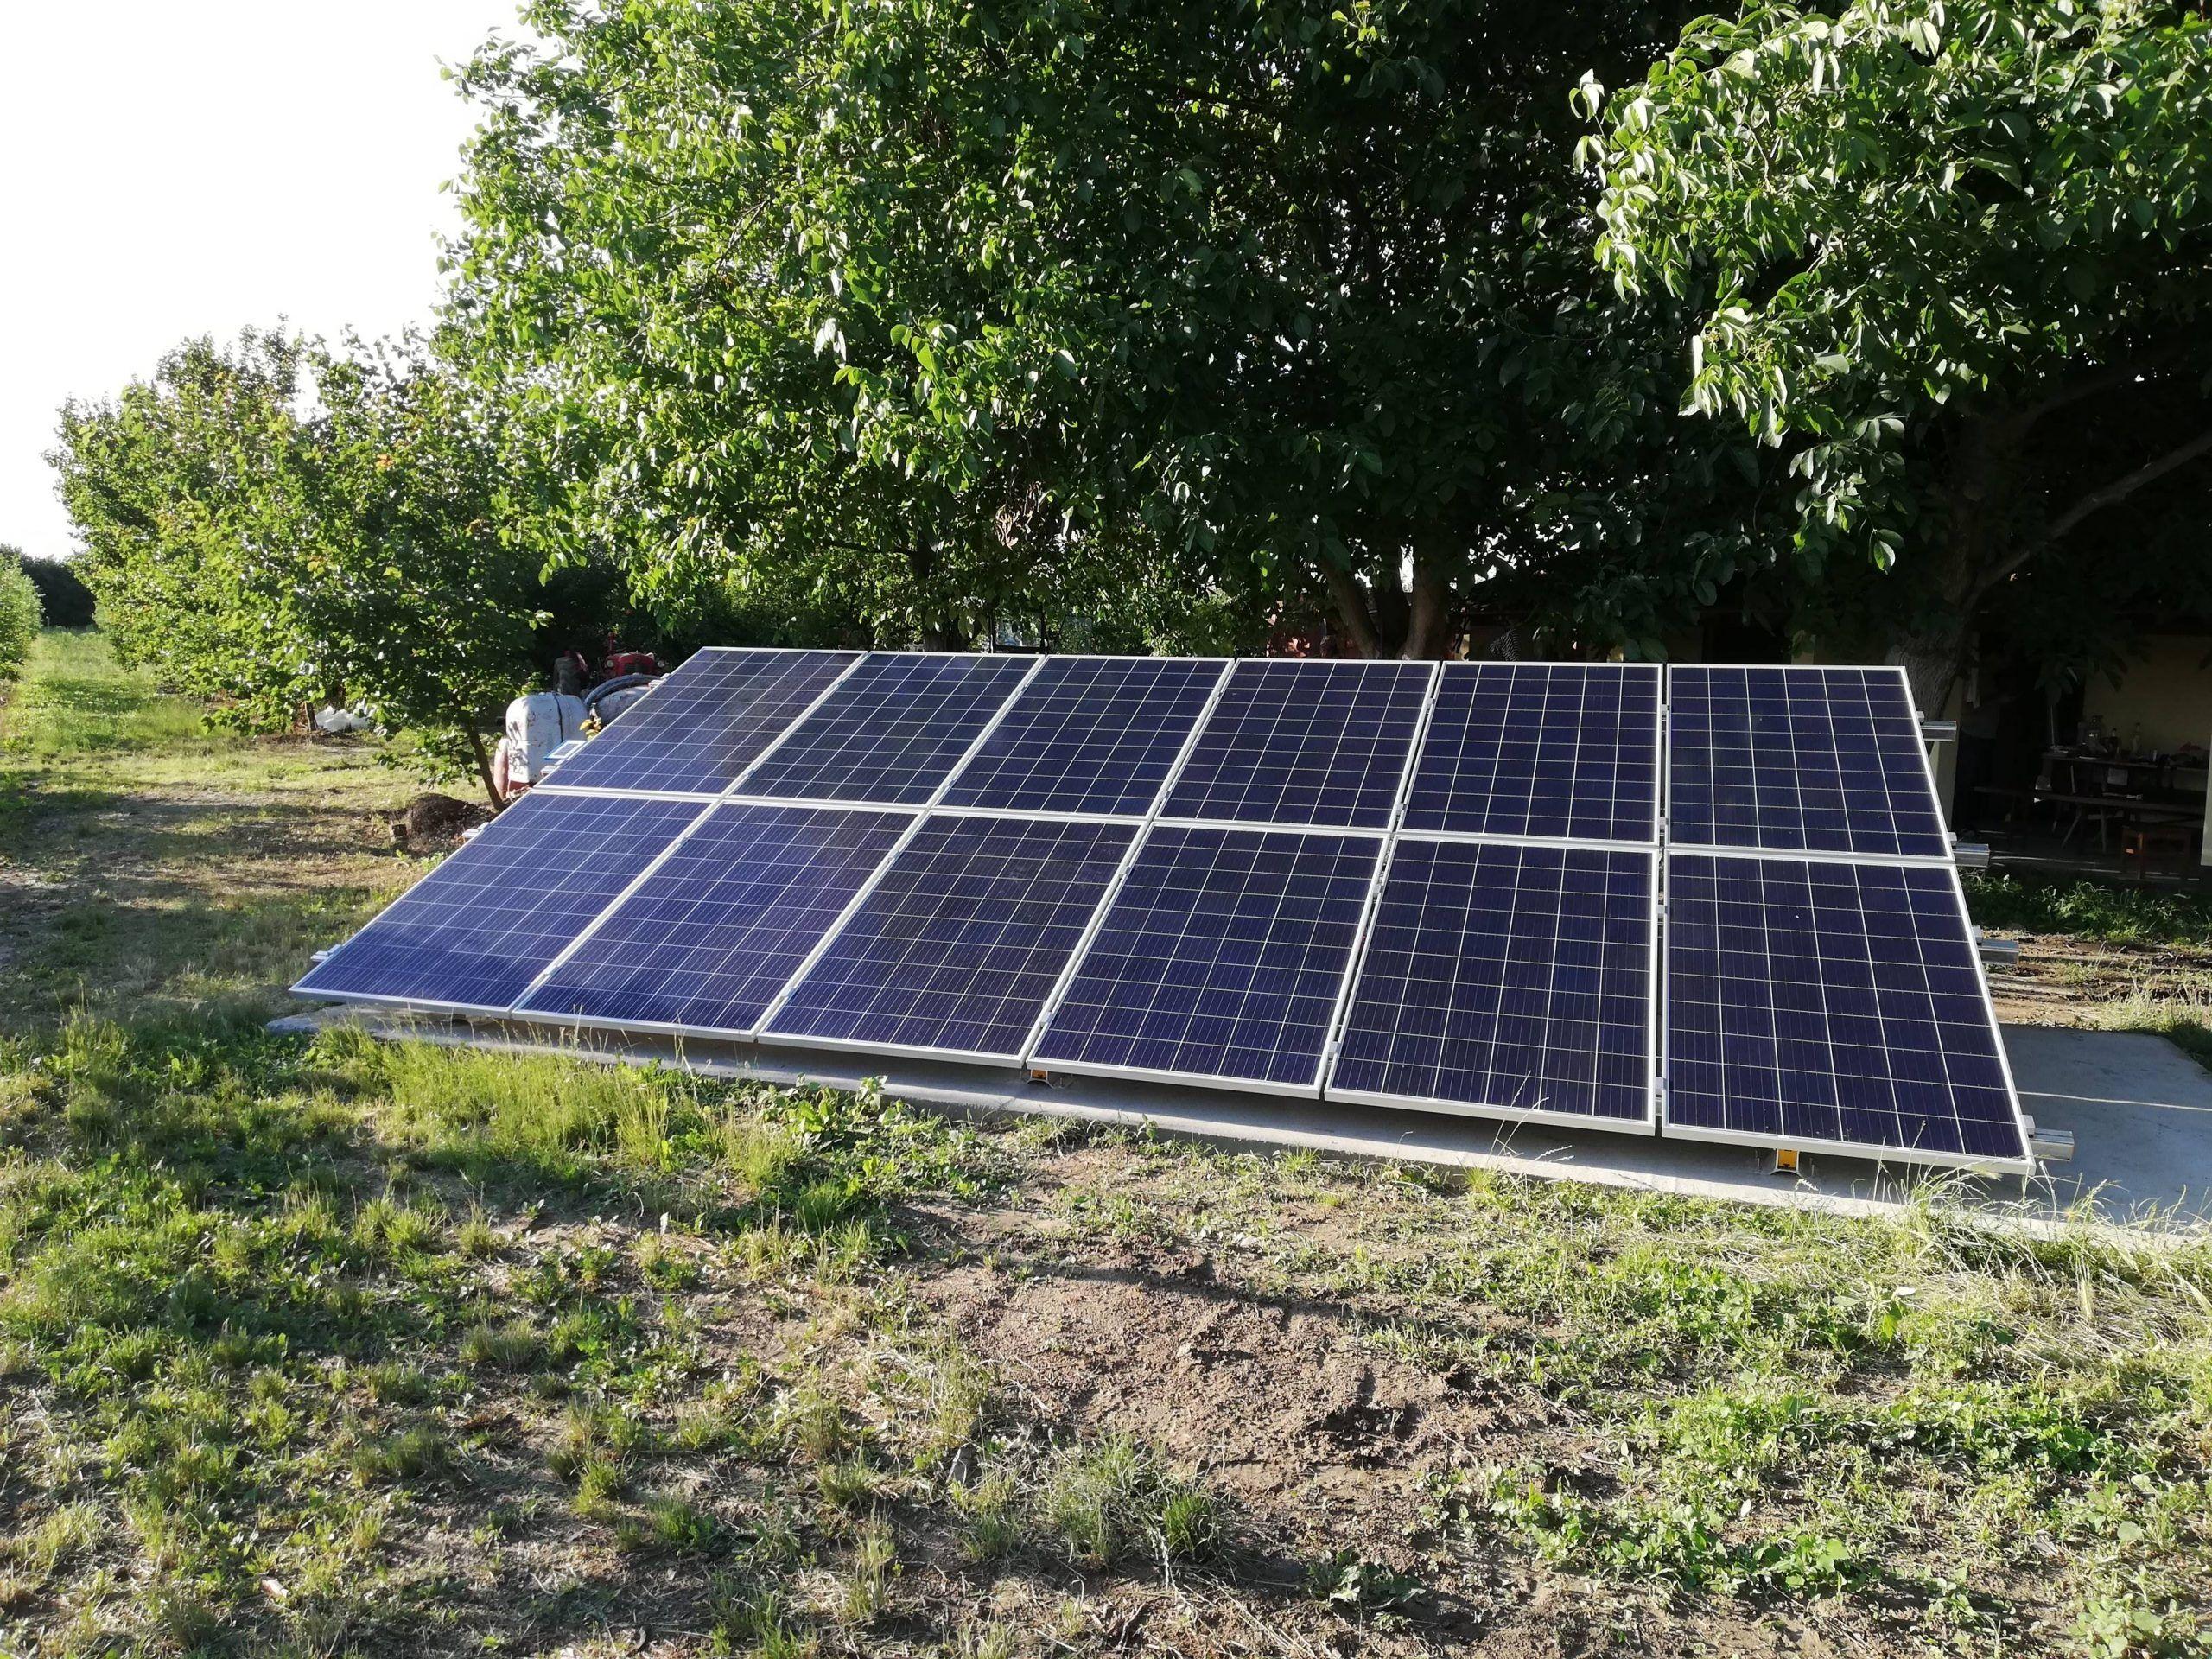 Kac Projekat Solarnog Navodnjavanja